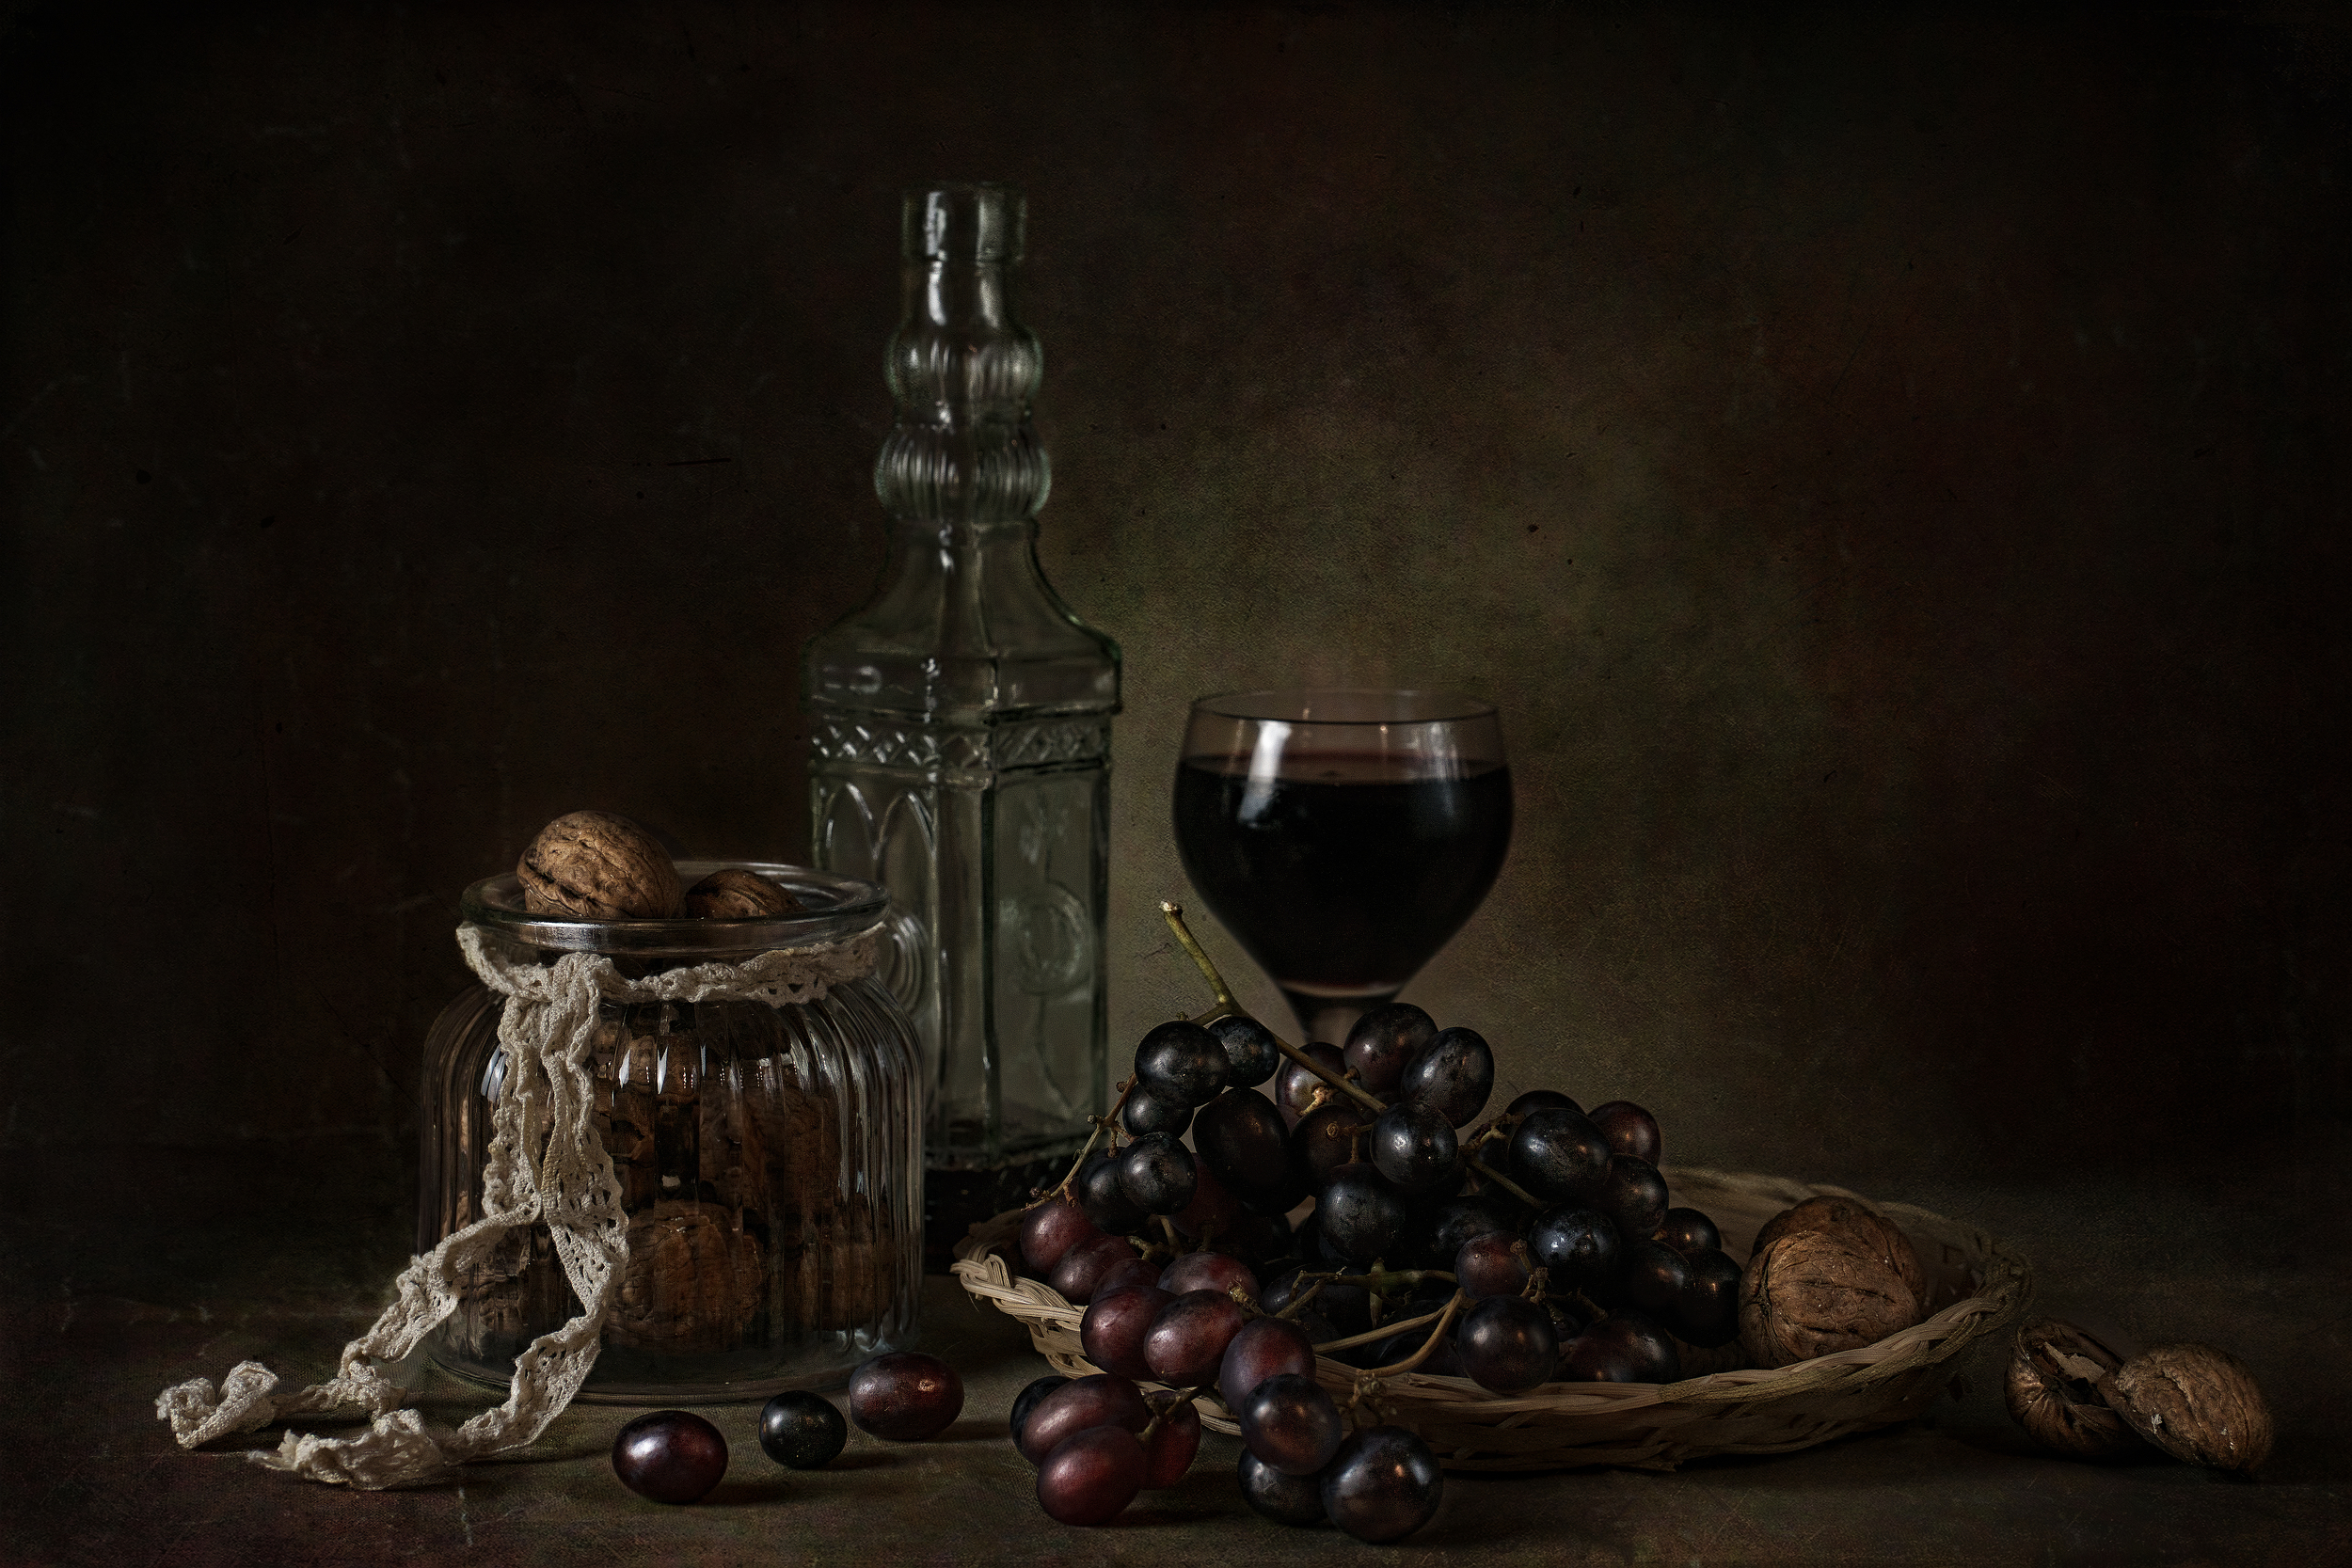 still life with berries, still life, berries, wine, glass, elegance, drink, alcohol, bottle, wineglass, object, fruit, decoration, table, home, arts, modern world, society, grapes, fine art, food, vegetarian, dessert, walnuts, Костин Анжелика